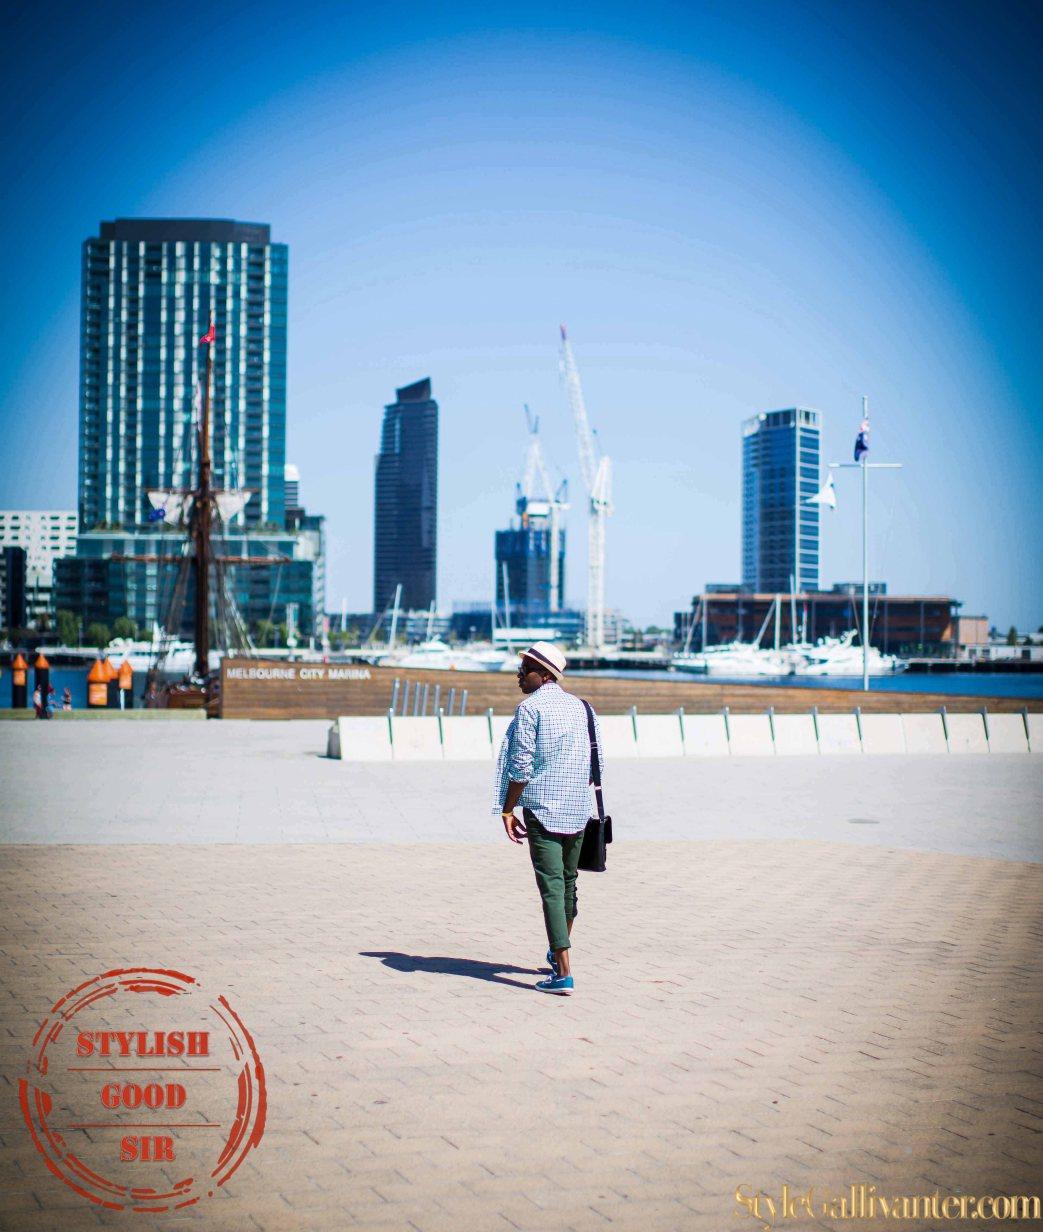 stylish-good-sir_top-menswear-blogs-melbourne-australia_melbourne's-top-menswear-blogs_mens-fashion-melbourne_high-fashion-men_australias-best-menswear-blogs-33